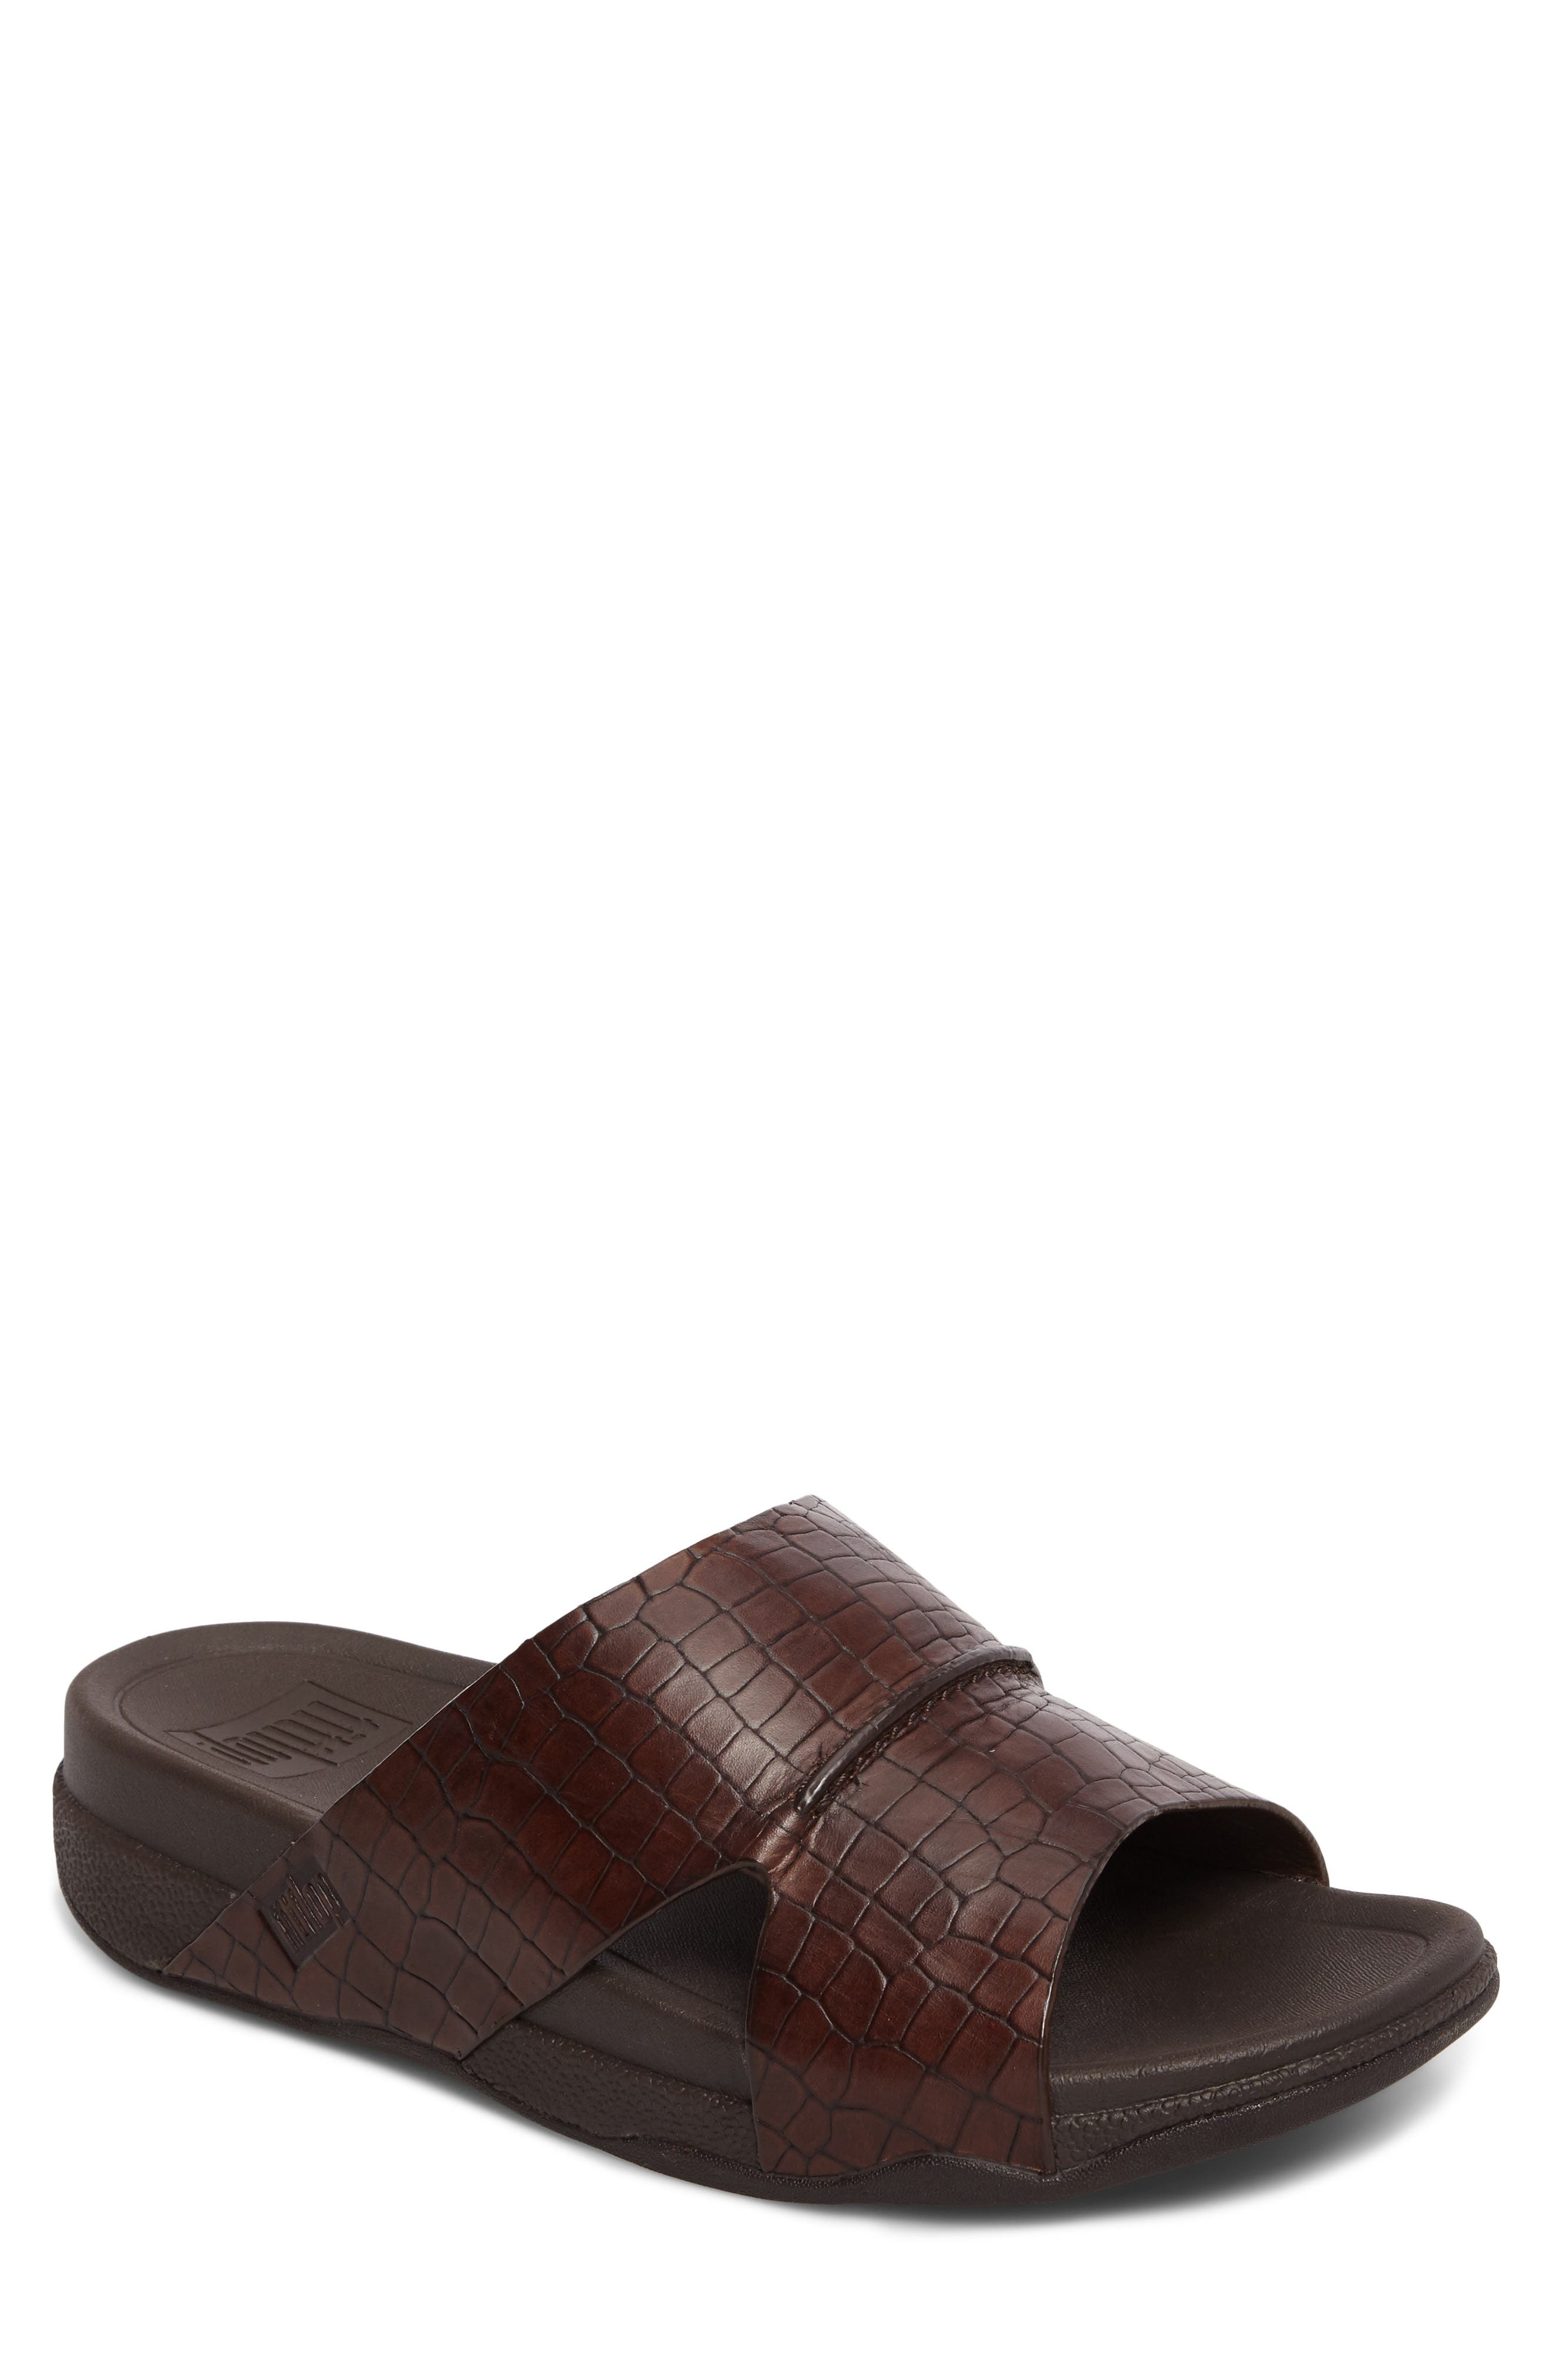 Bando Slide Sandal,                             Main thumbnail 1, color,                             CHOCOLATE LEATHER